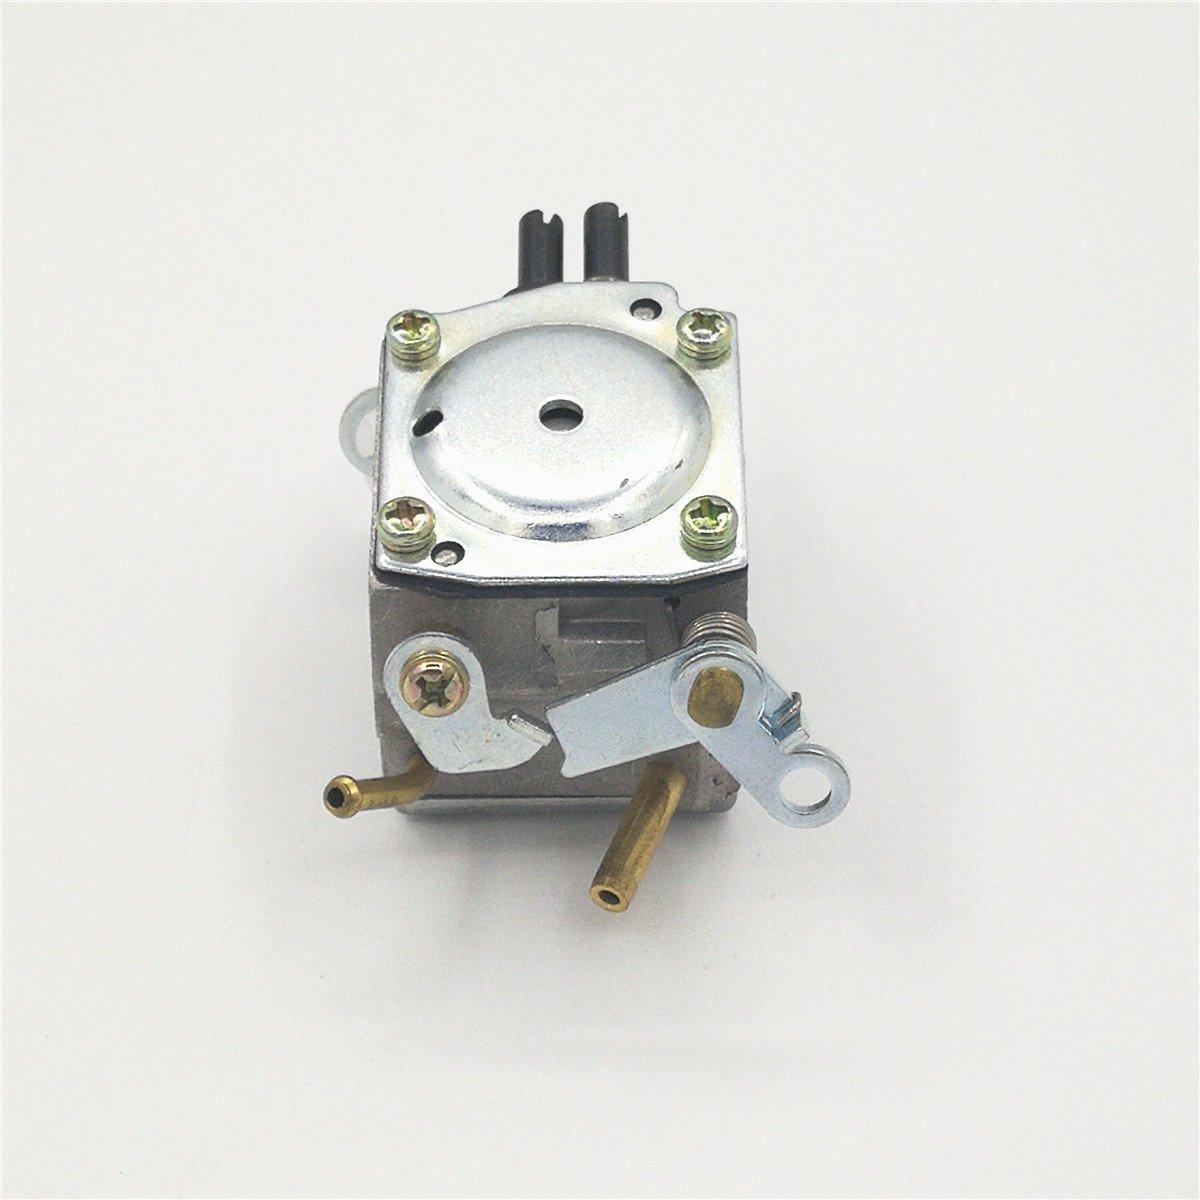 Shioshen Carburatore per Motosega Husqvarna 362 365 371 372 372XP motoseghe 5032818-01 503 28 32-03